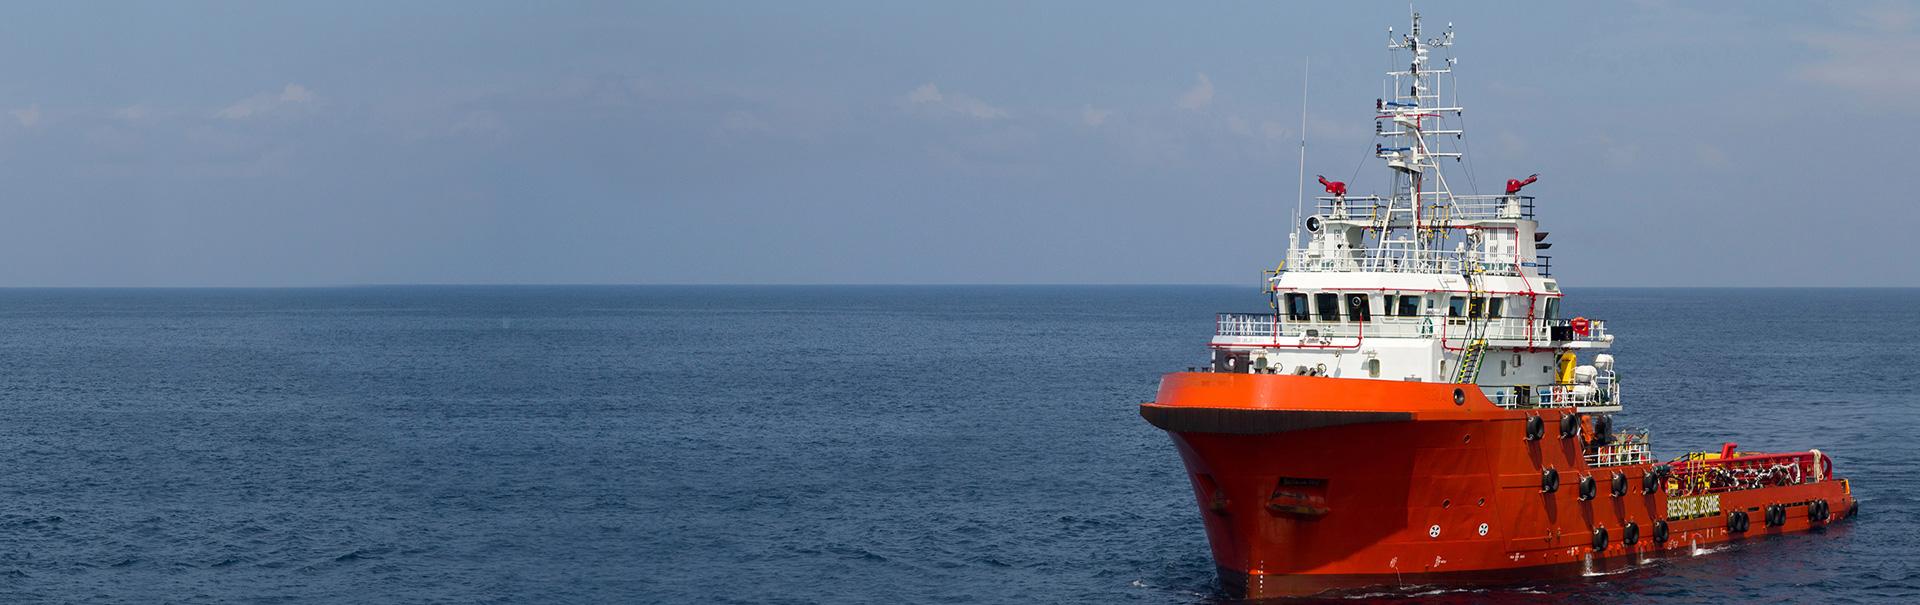 Valentine Maritime Ltd – Al Bawardi Enterprises